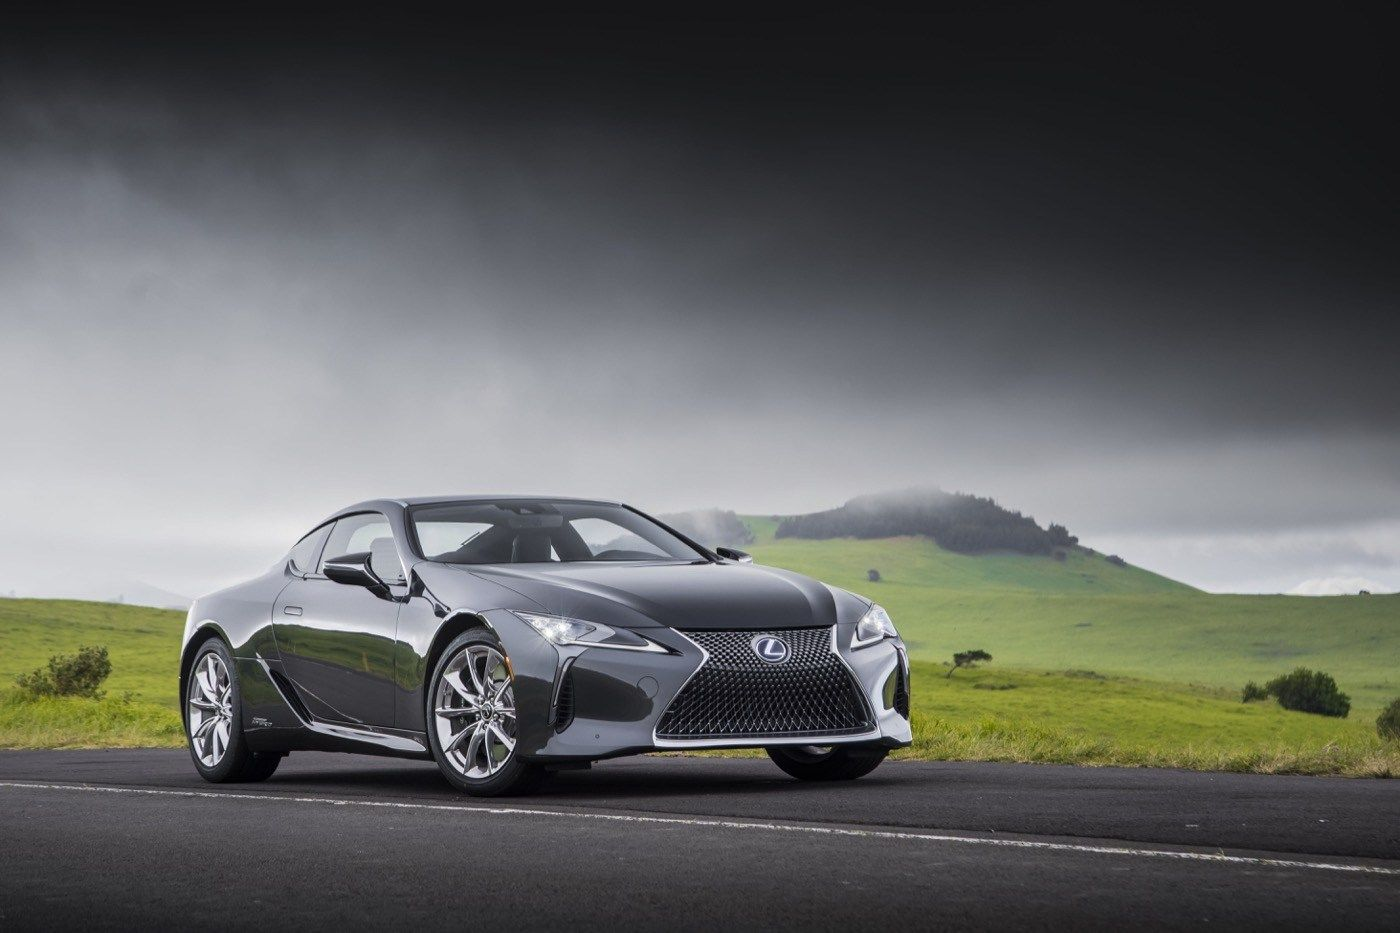 2018 Lexus LC500 Lexus lc, Dream cars, Hybrid car